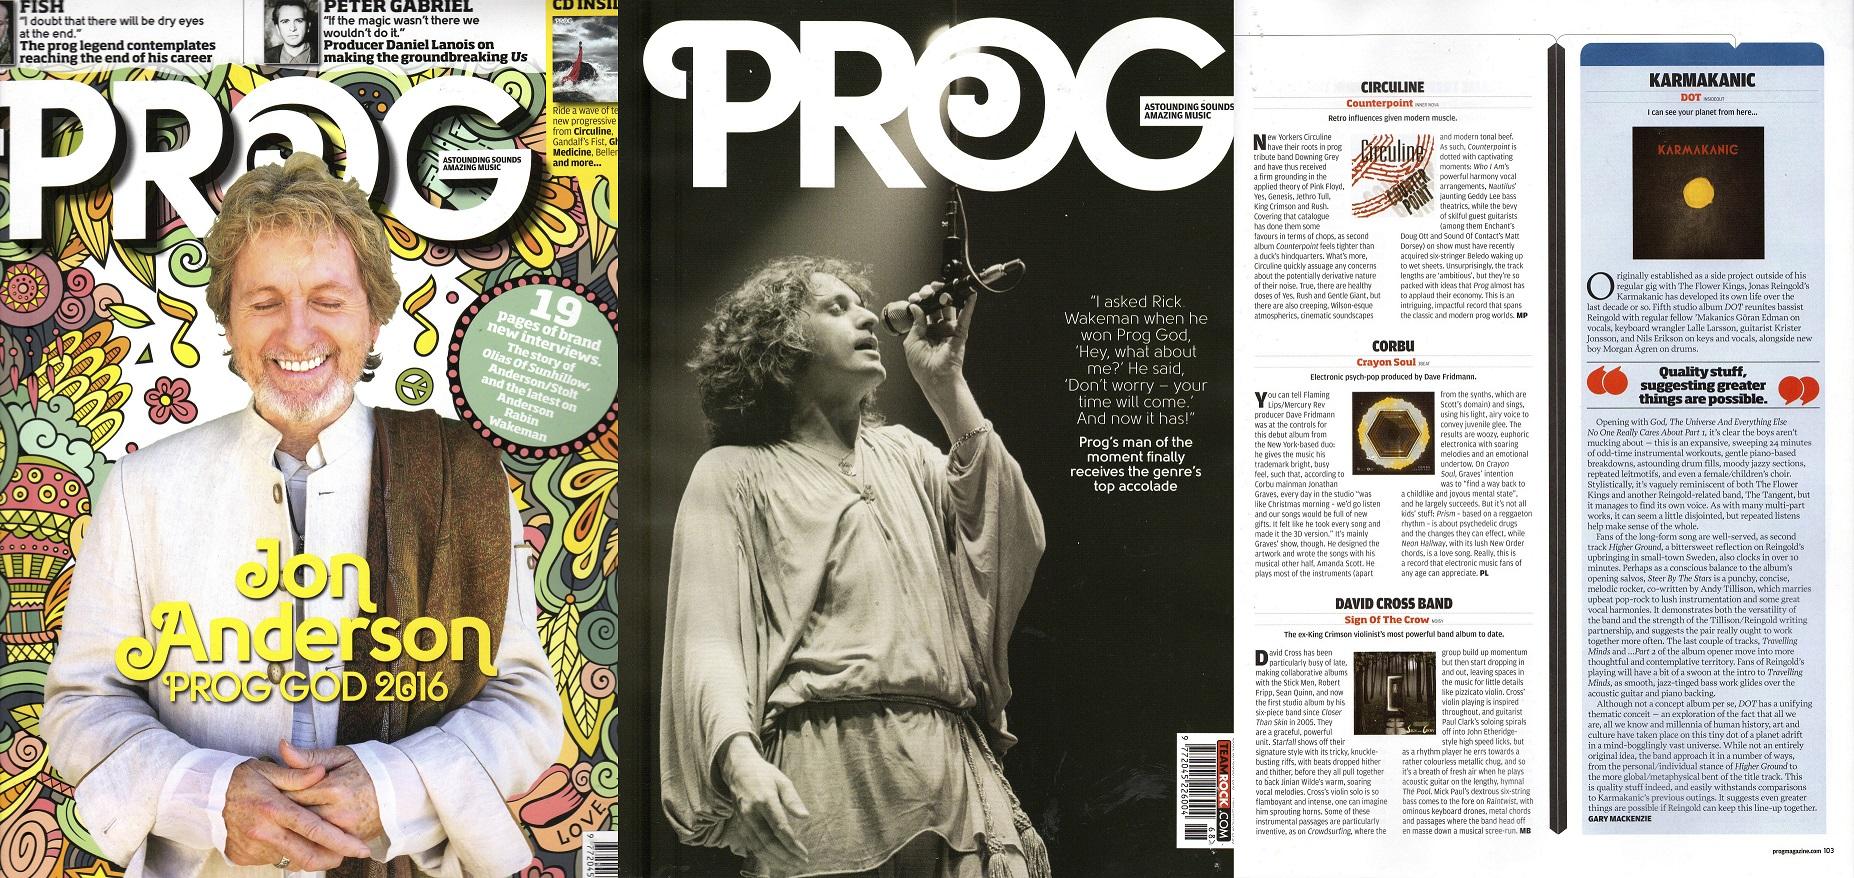 Circuline-ProgMagazine-Review-JulyAugust2016-SentFromNickyFireworks_1--RESIZED-v2